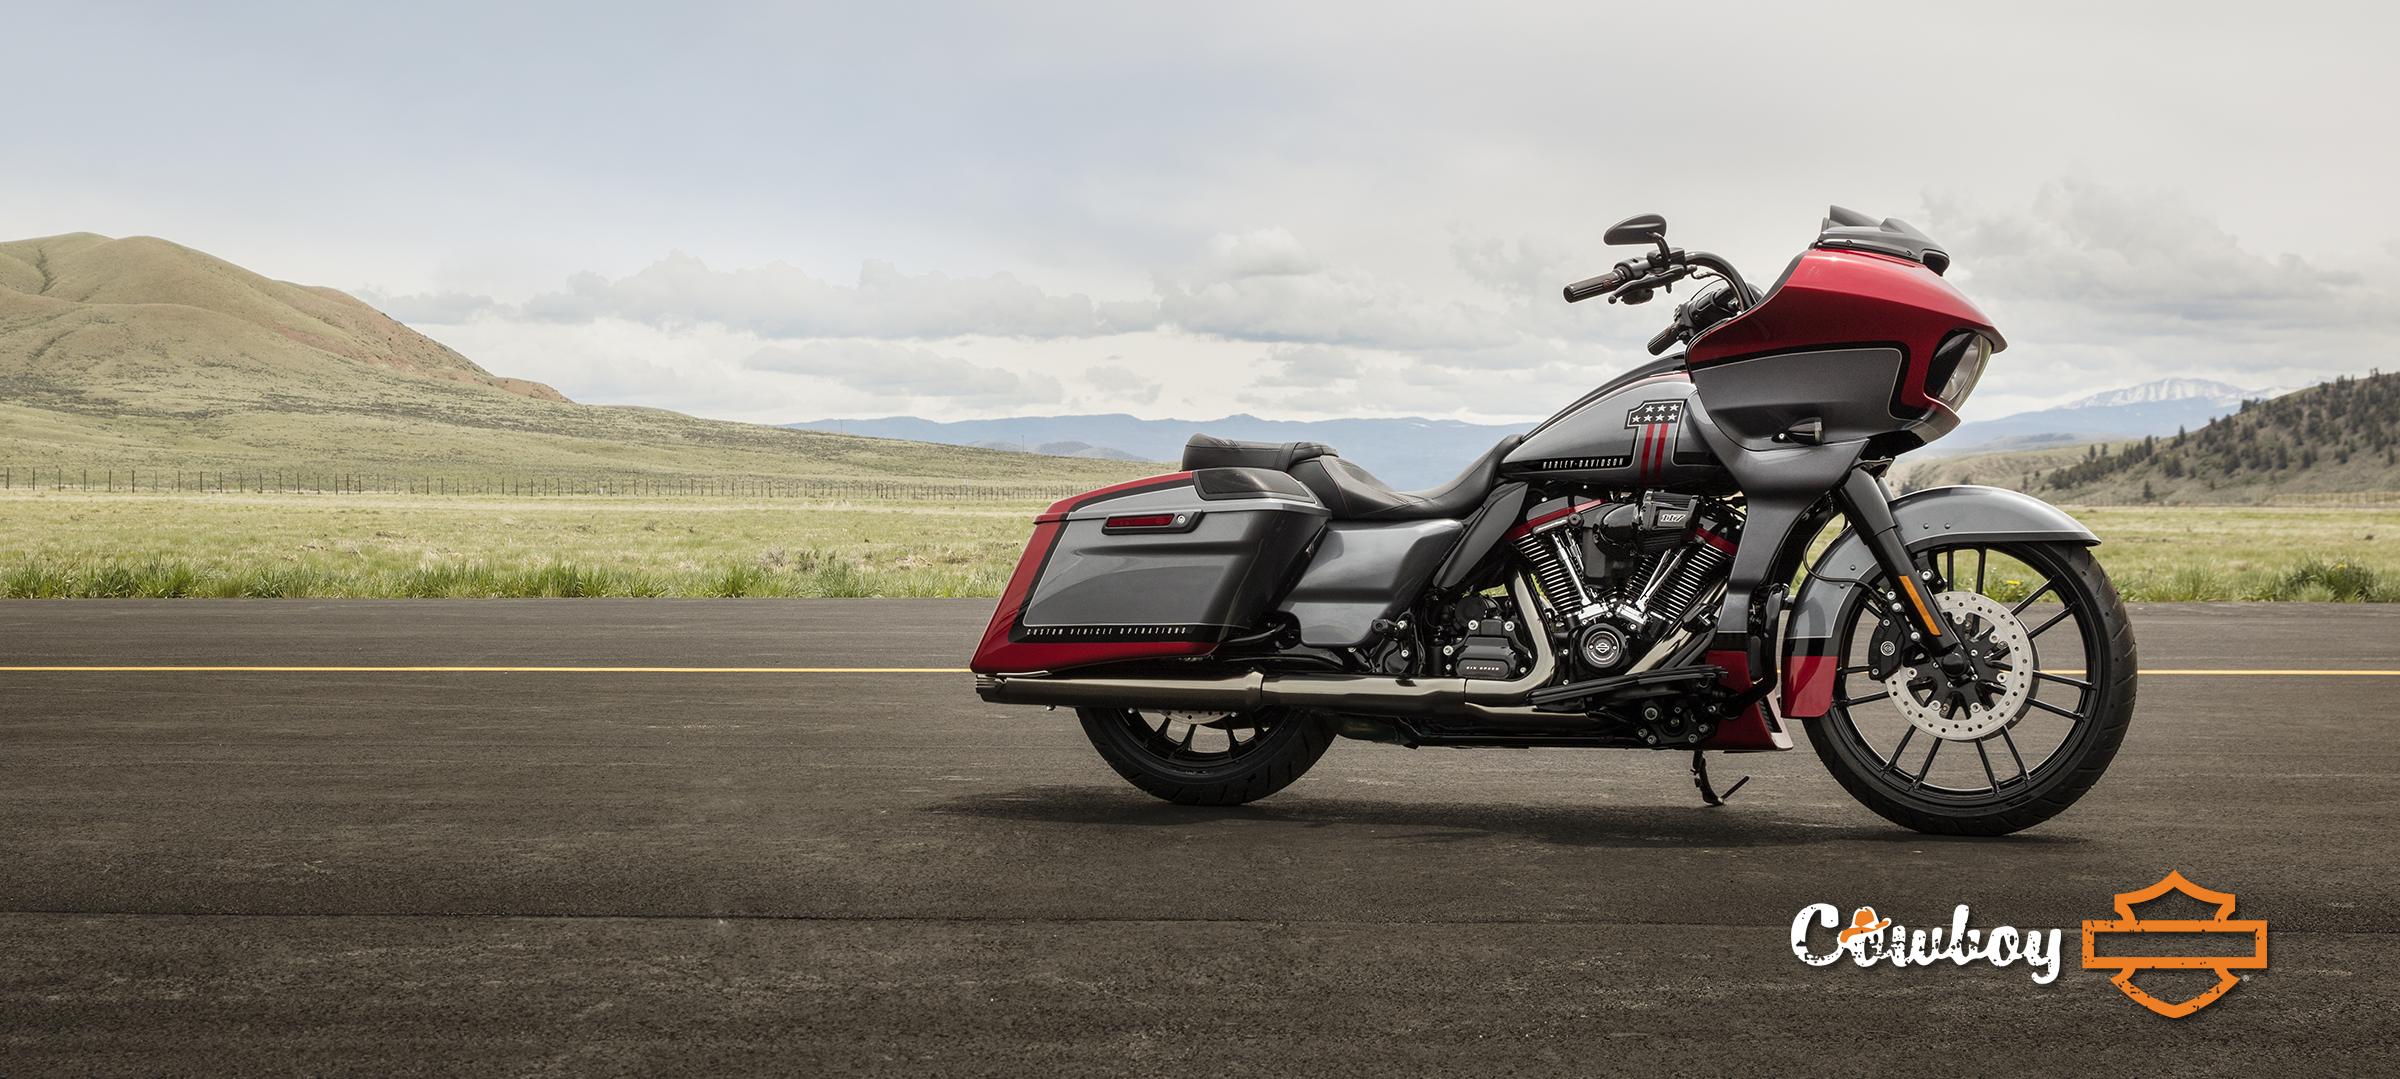 Cowboys Alamo City Harley Davidson 2014 Tri Glide Trailer Wiring Harness You Are An